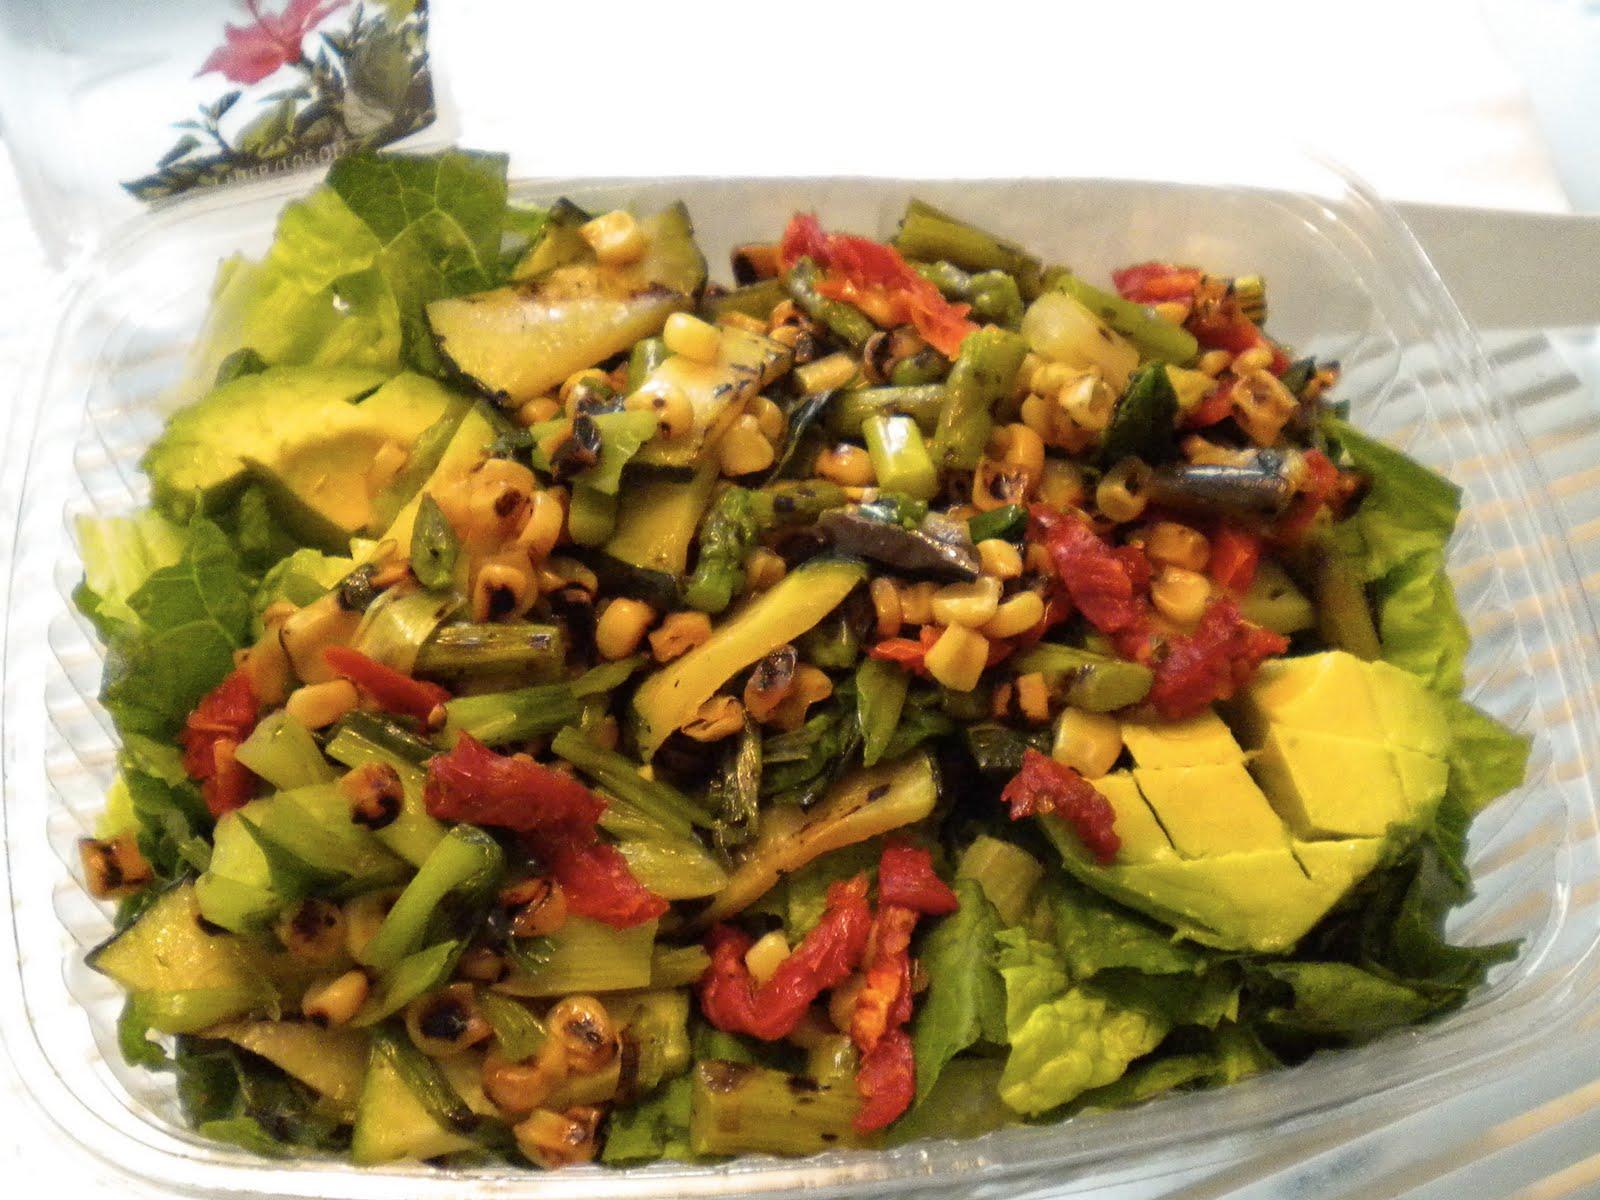 California Pizza Kitchen Recipes Roasted Vegetable Salad